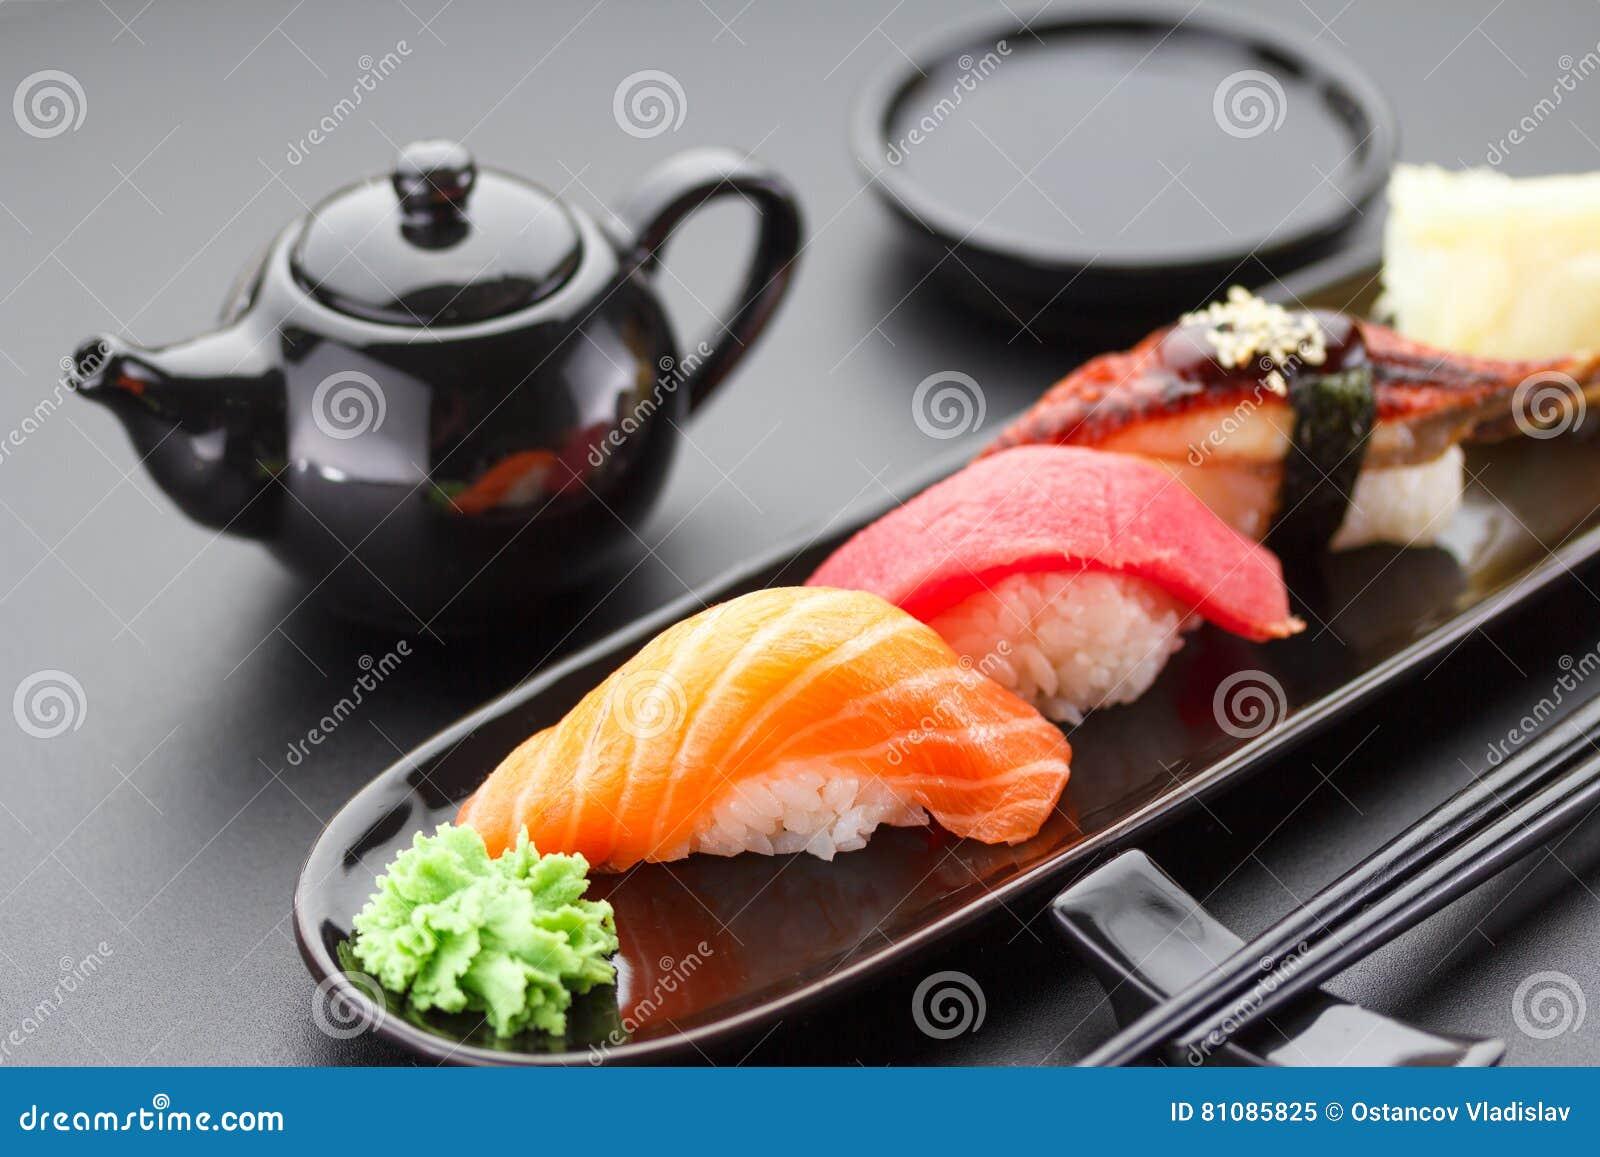 Cucina giapponese sushi fotografia stock immagine 81085825 for Cucine giapponesi